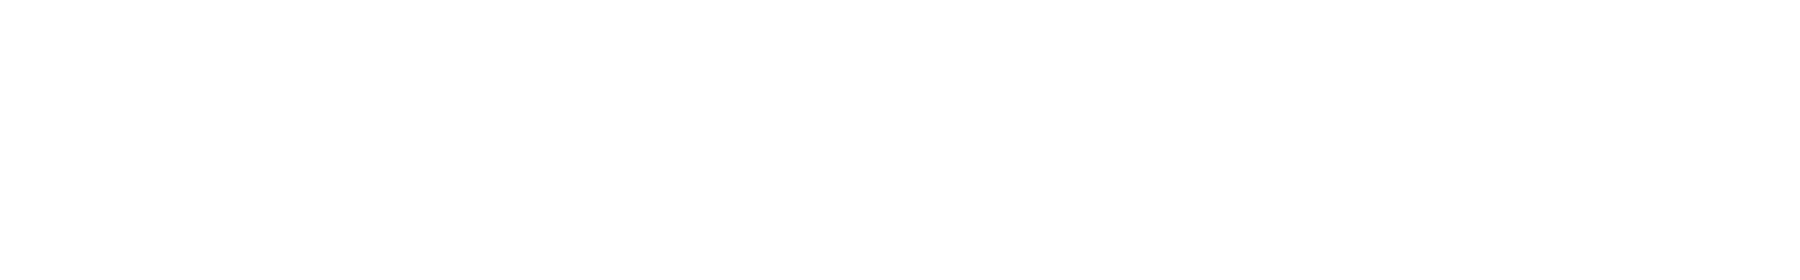 alvinspk17